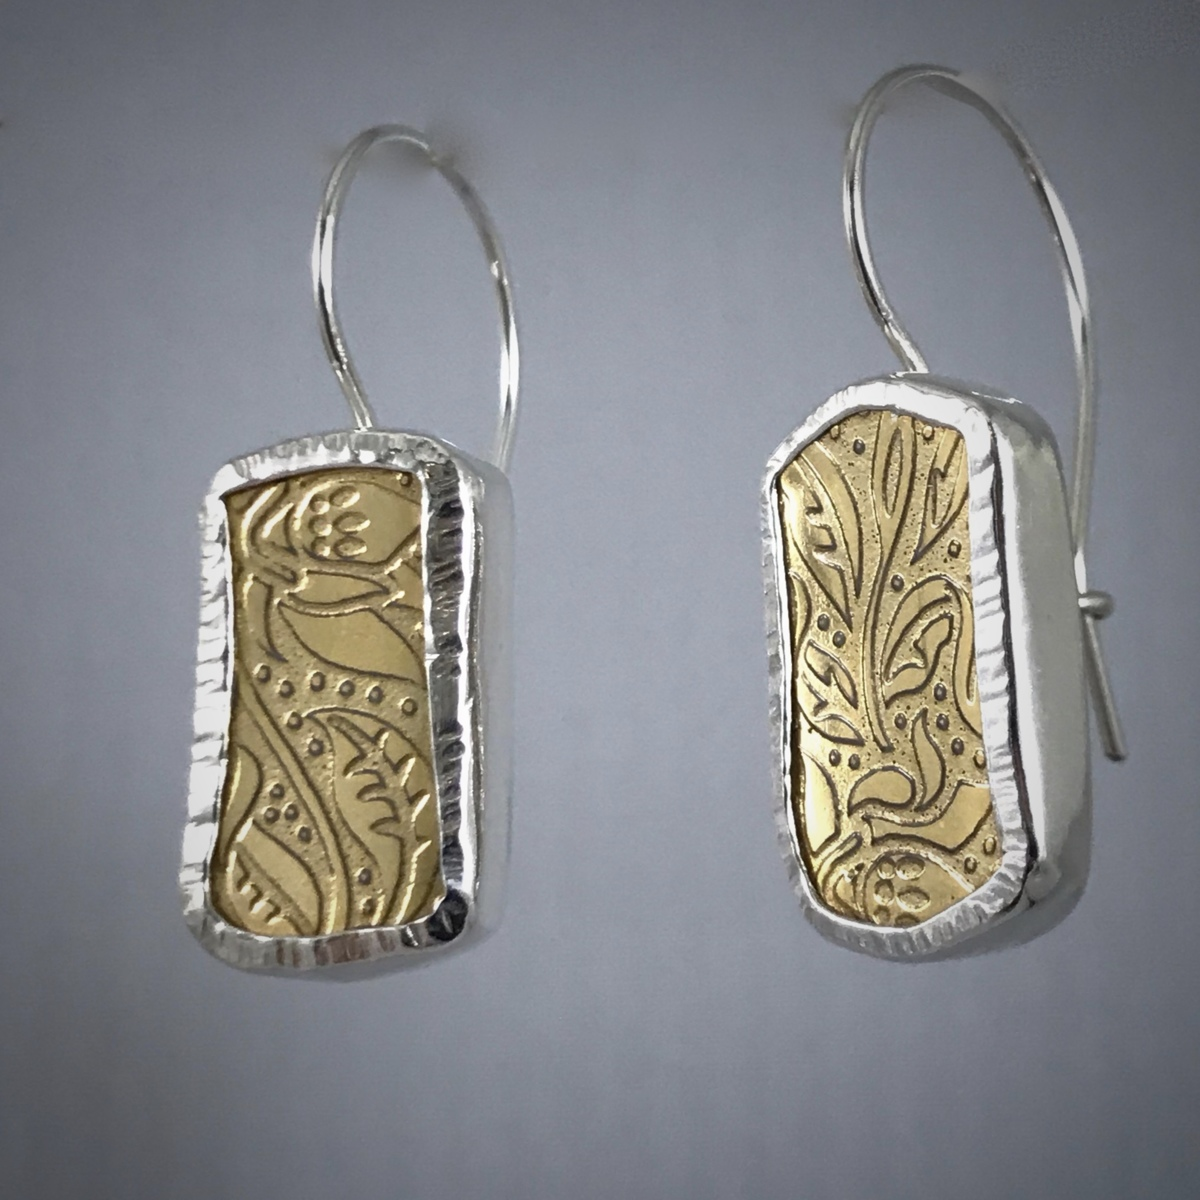 Wedgwood Cab Earrings (large view)